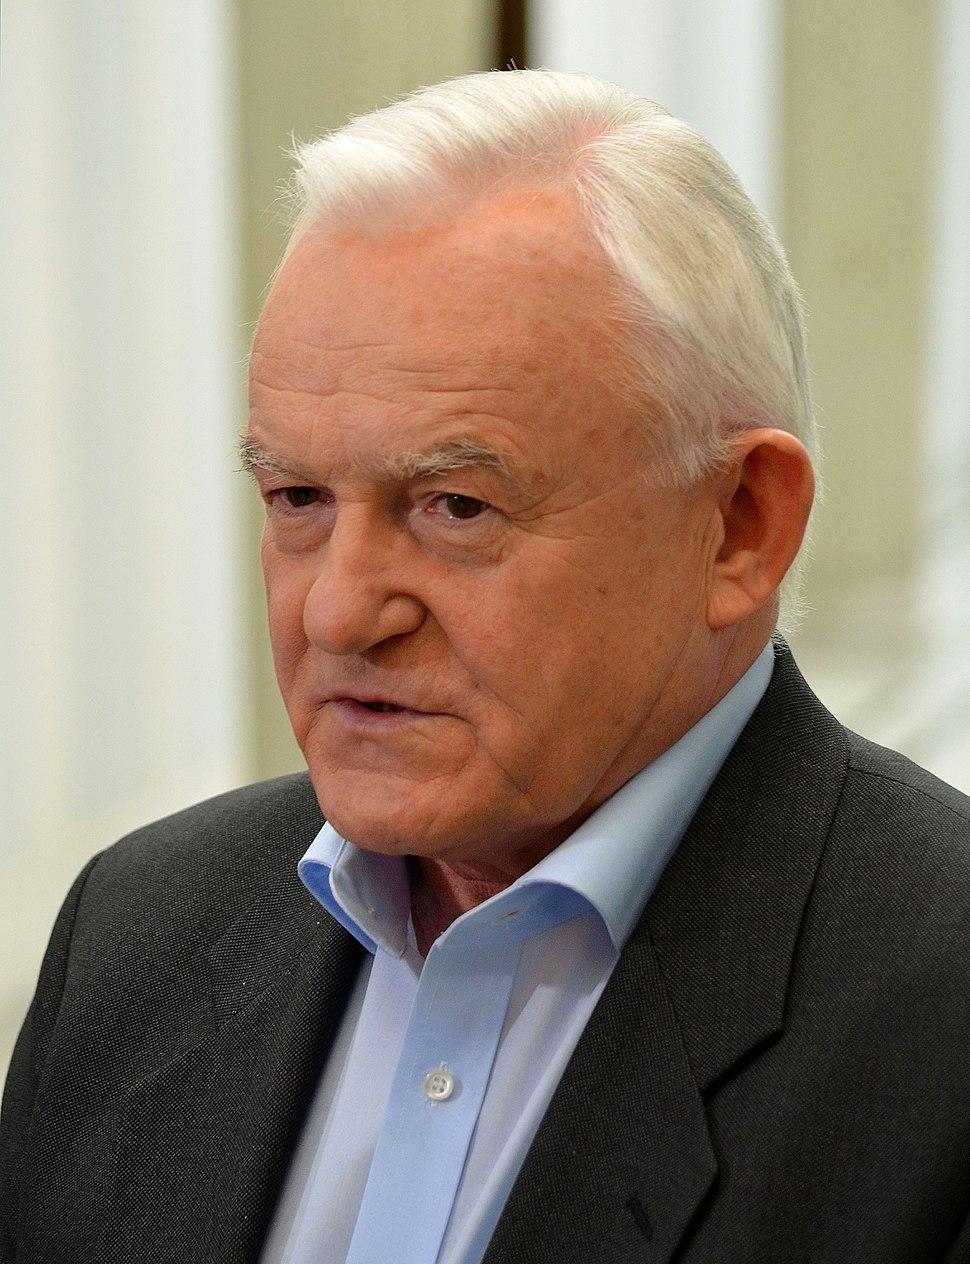 Leszek Miller Sejm 2013